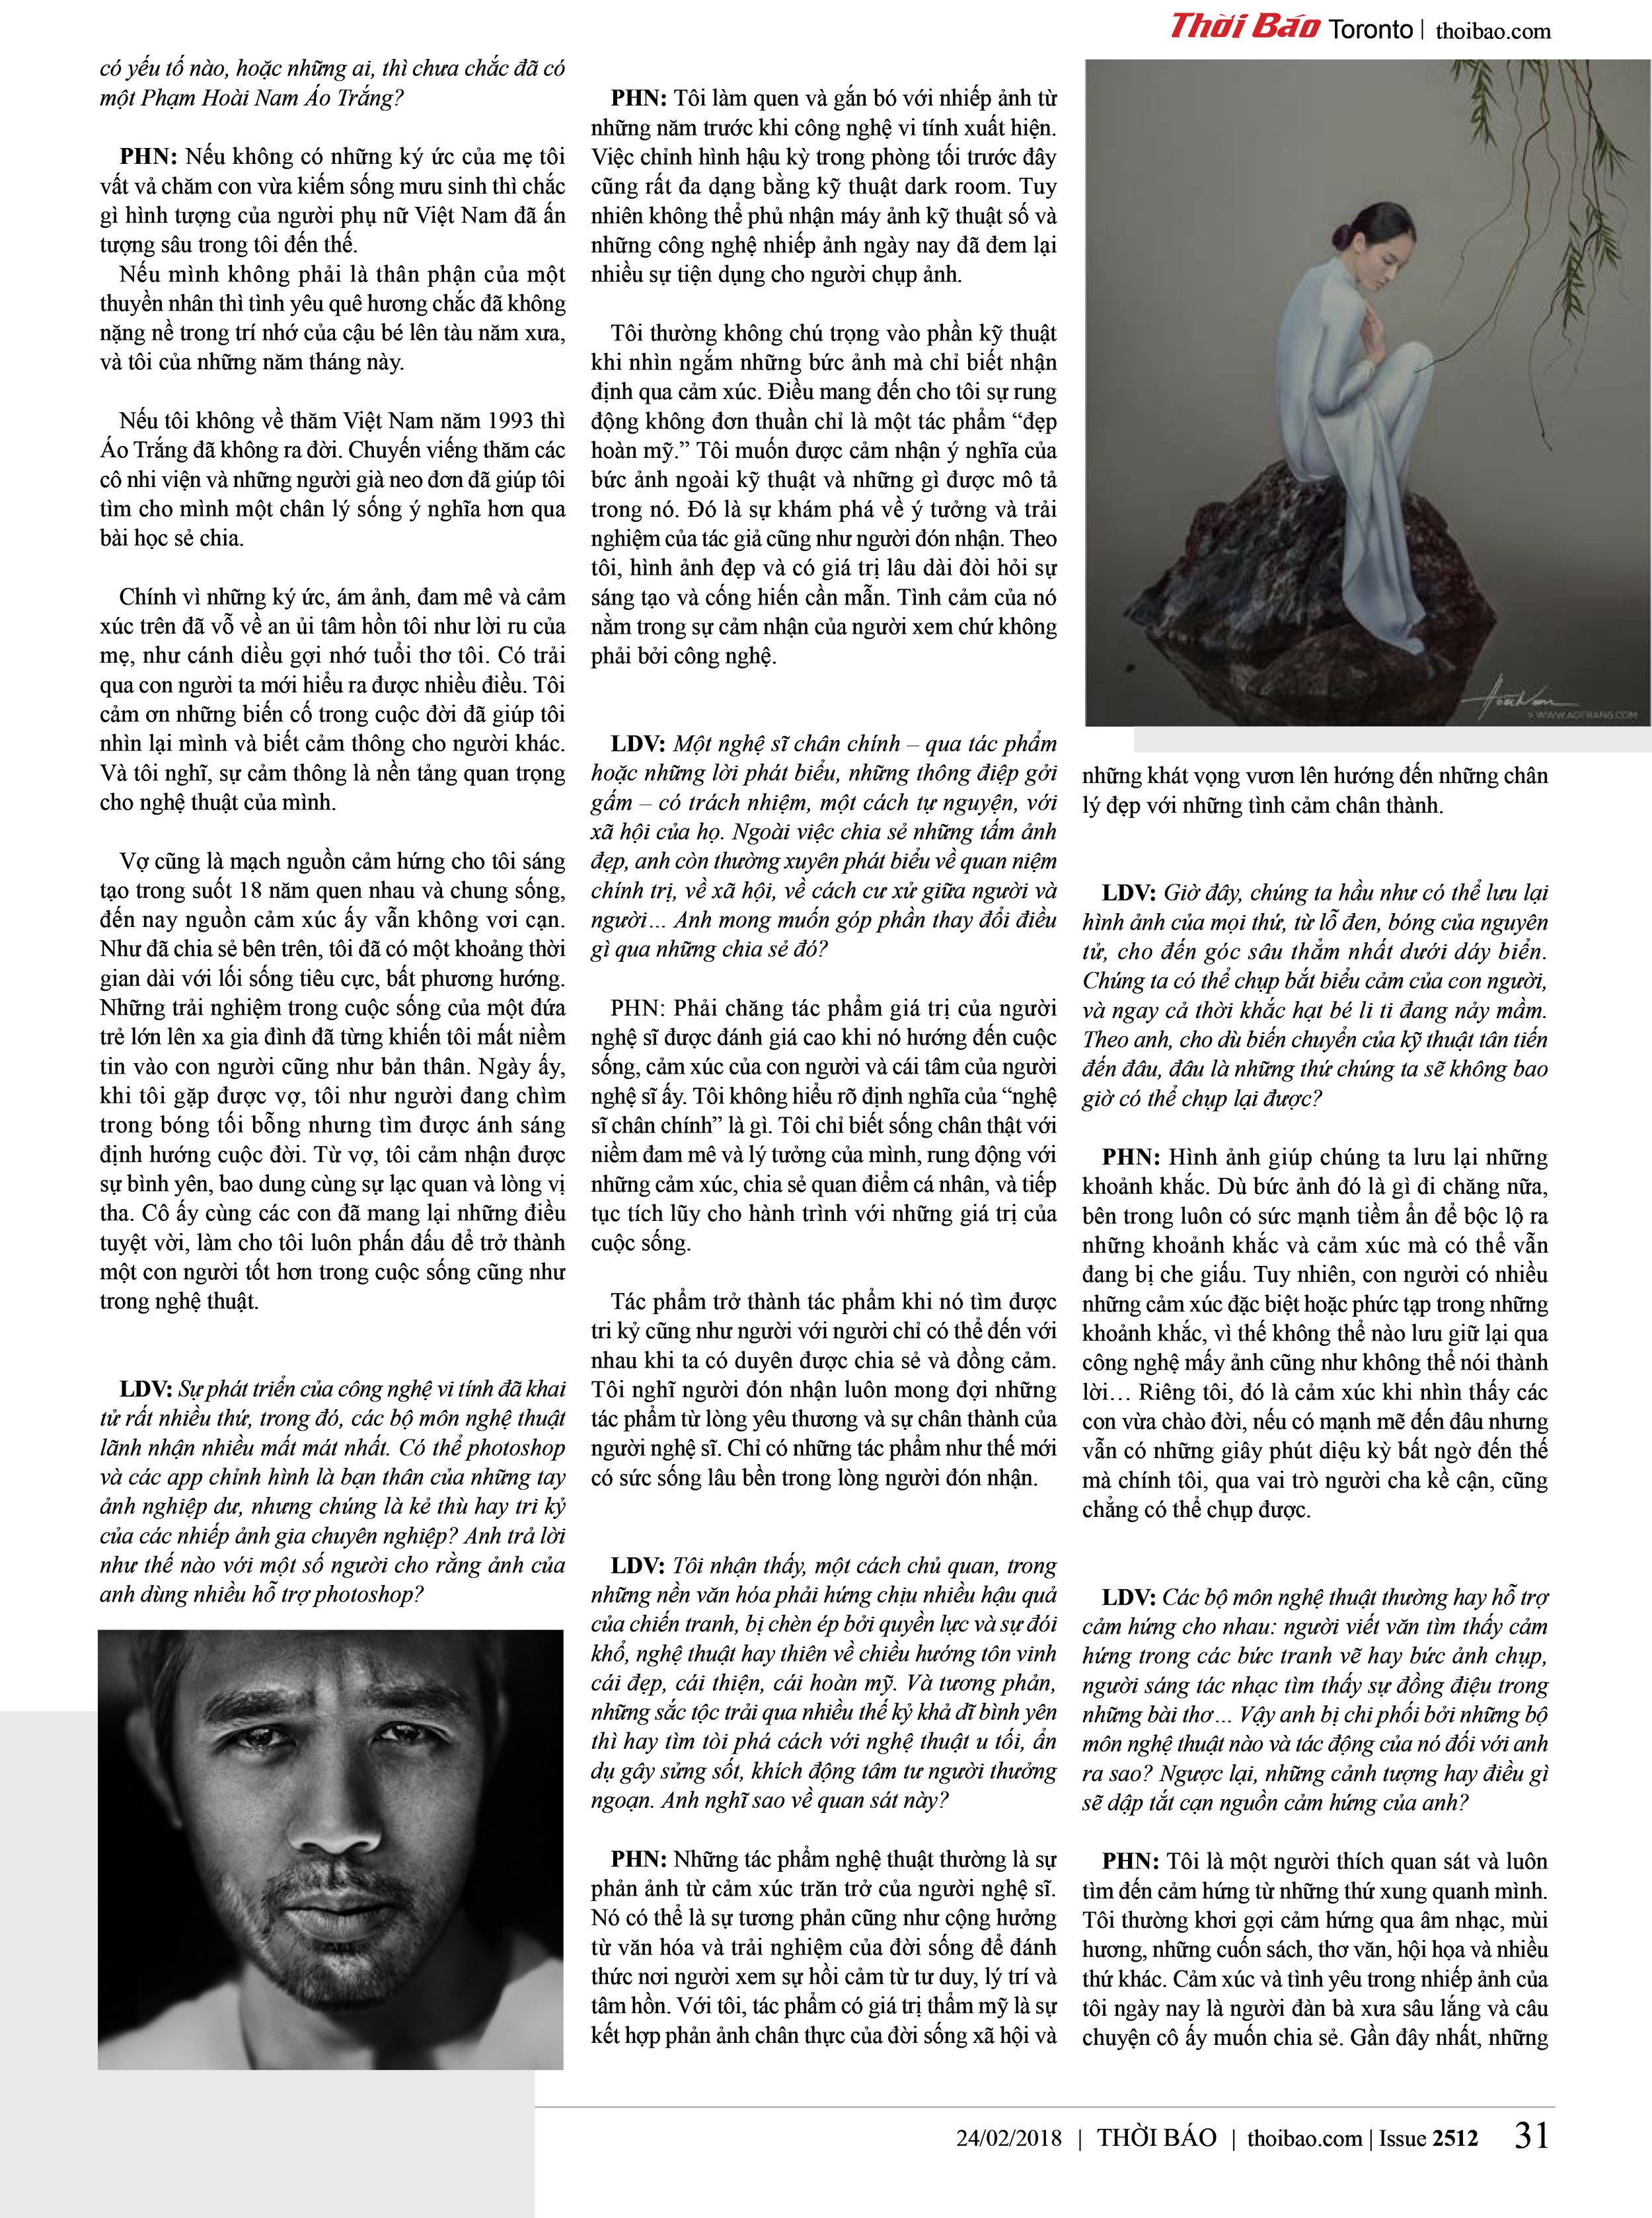 TB7-2512-Pham-Hoai-Nam-interview 2.jpg